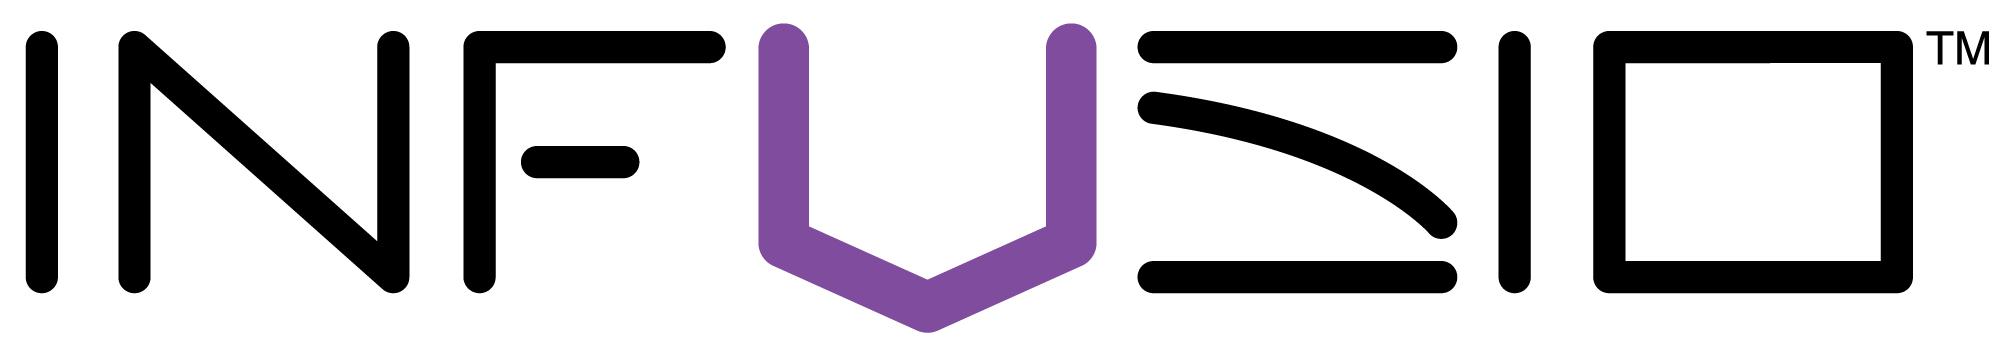 Infusio_Logo_Solid_Black_Lettering_Fat_Purple_U.jpg